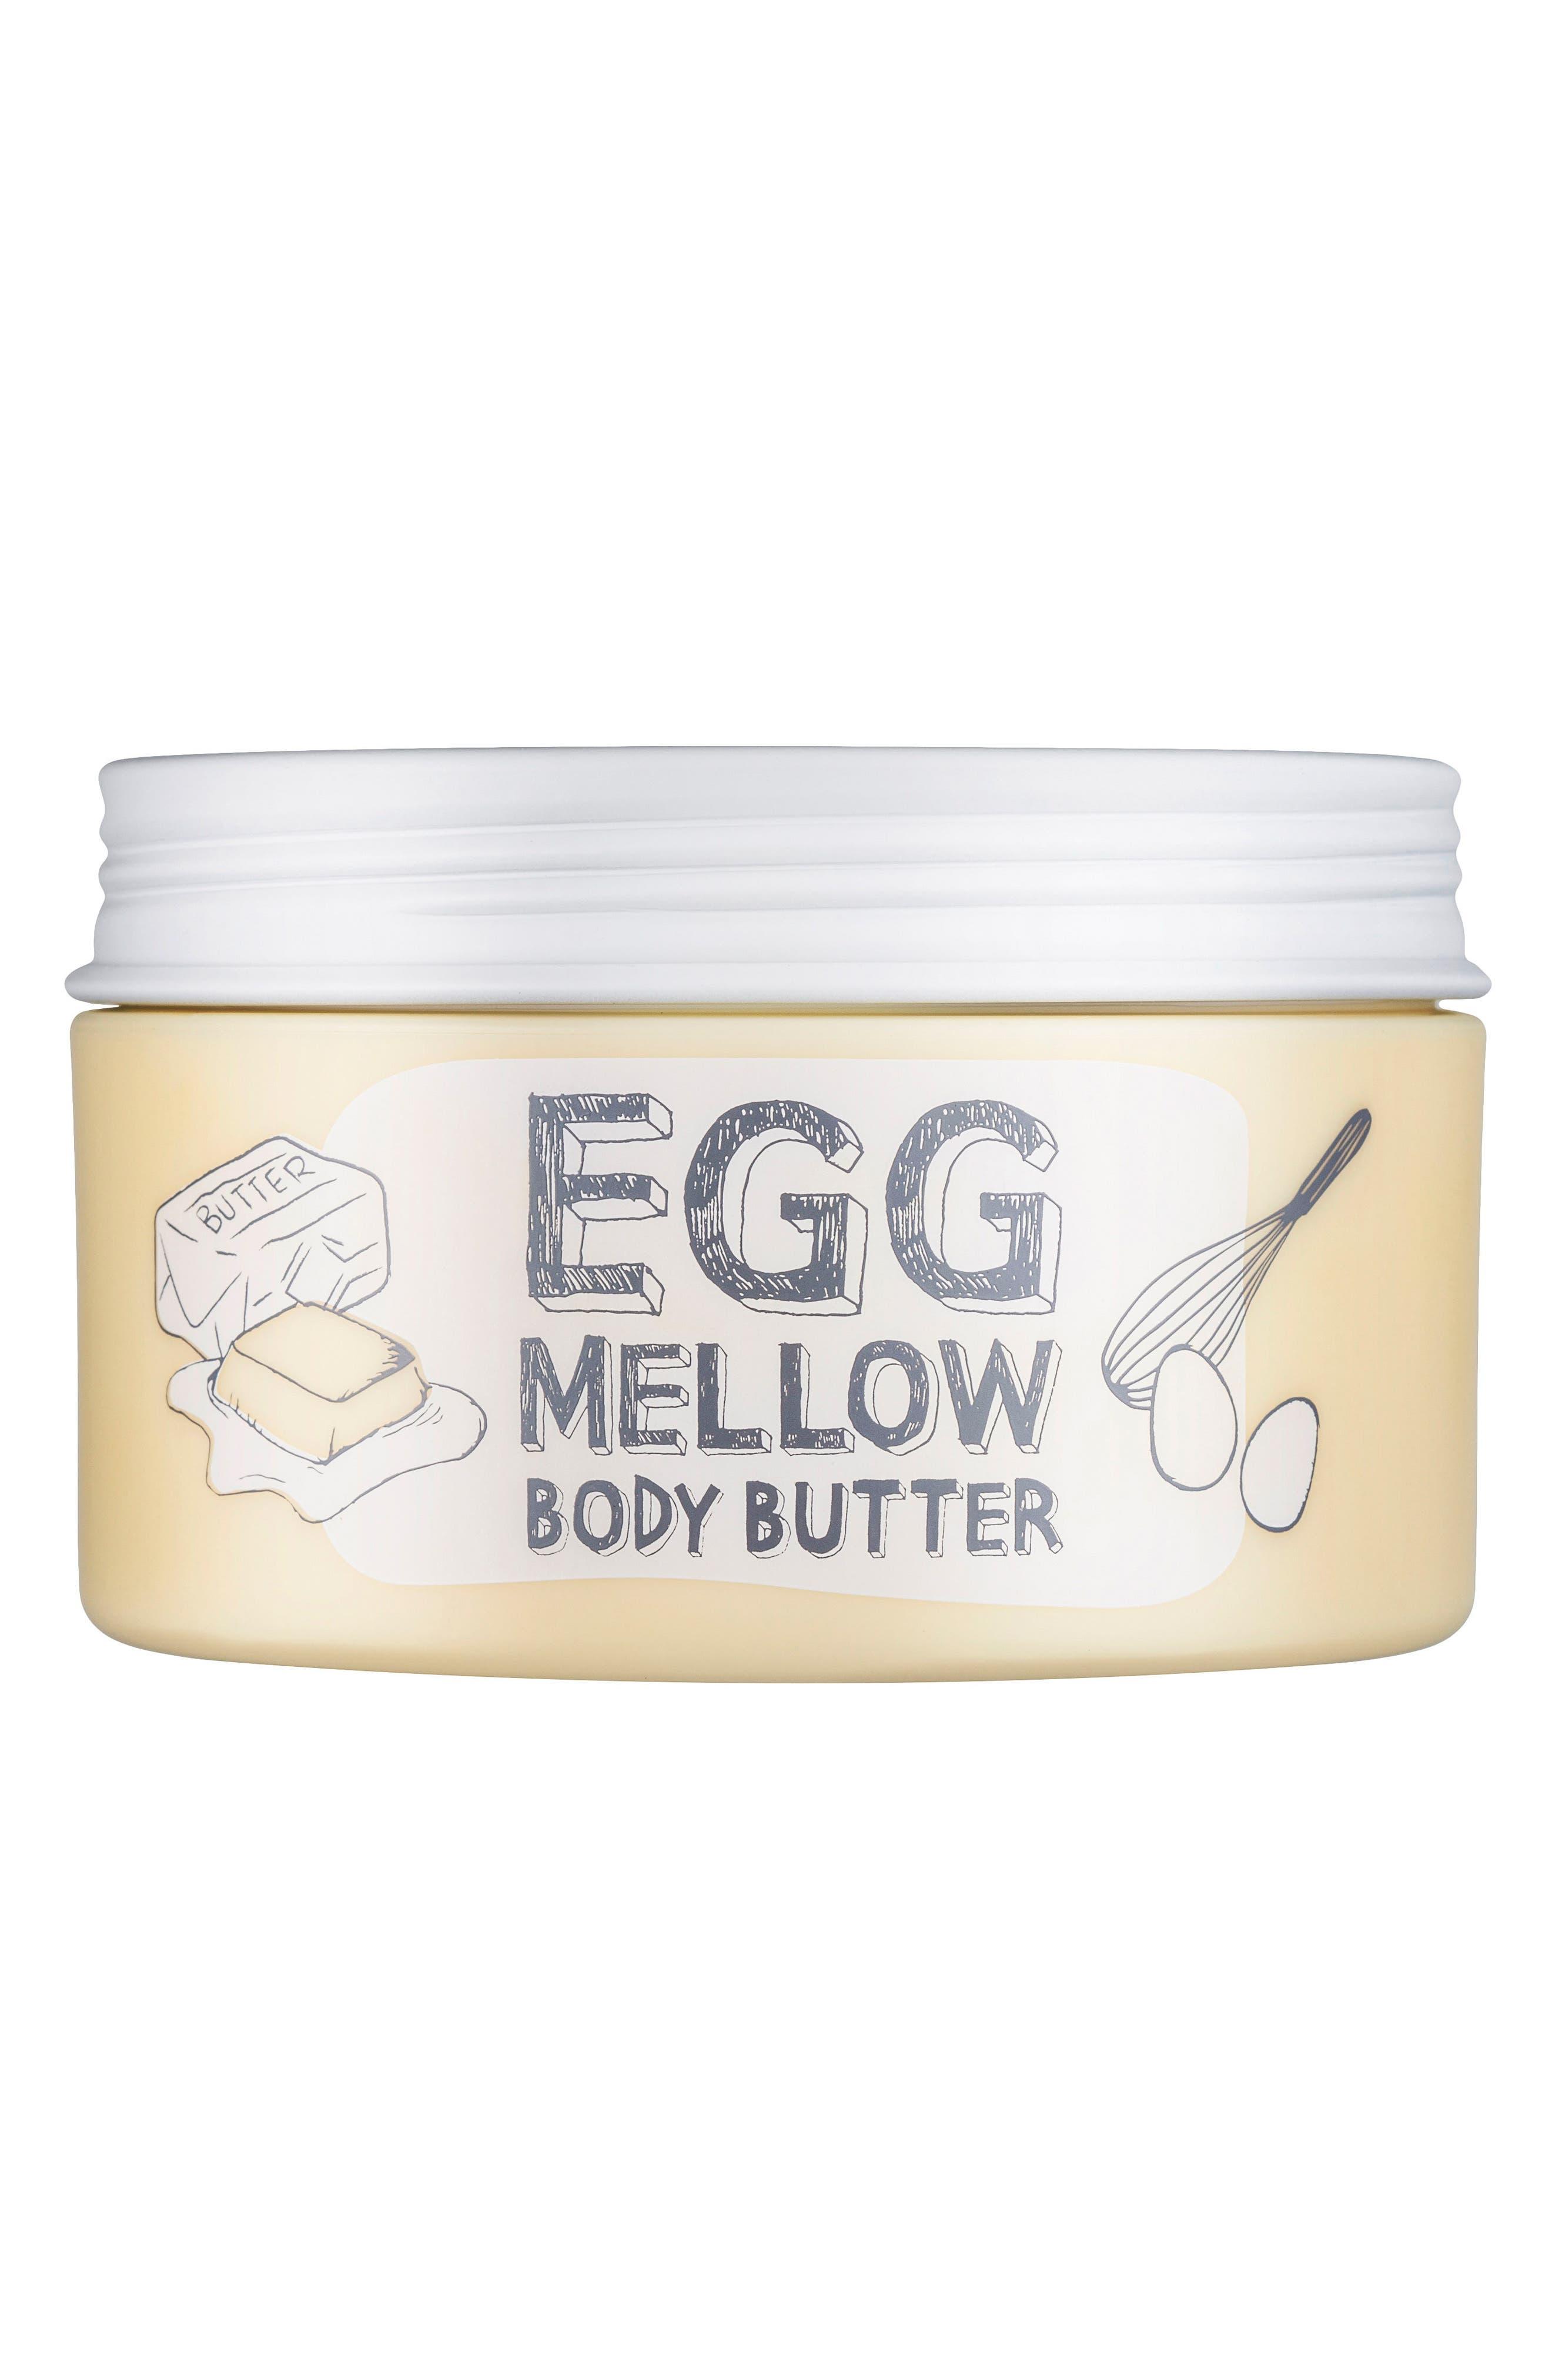 Egg Mellow Body Butter,                             Main thumbnail 1, color,                             NONE